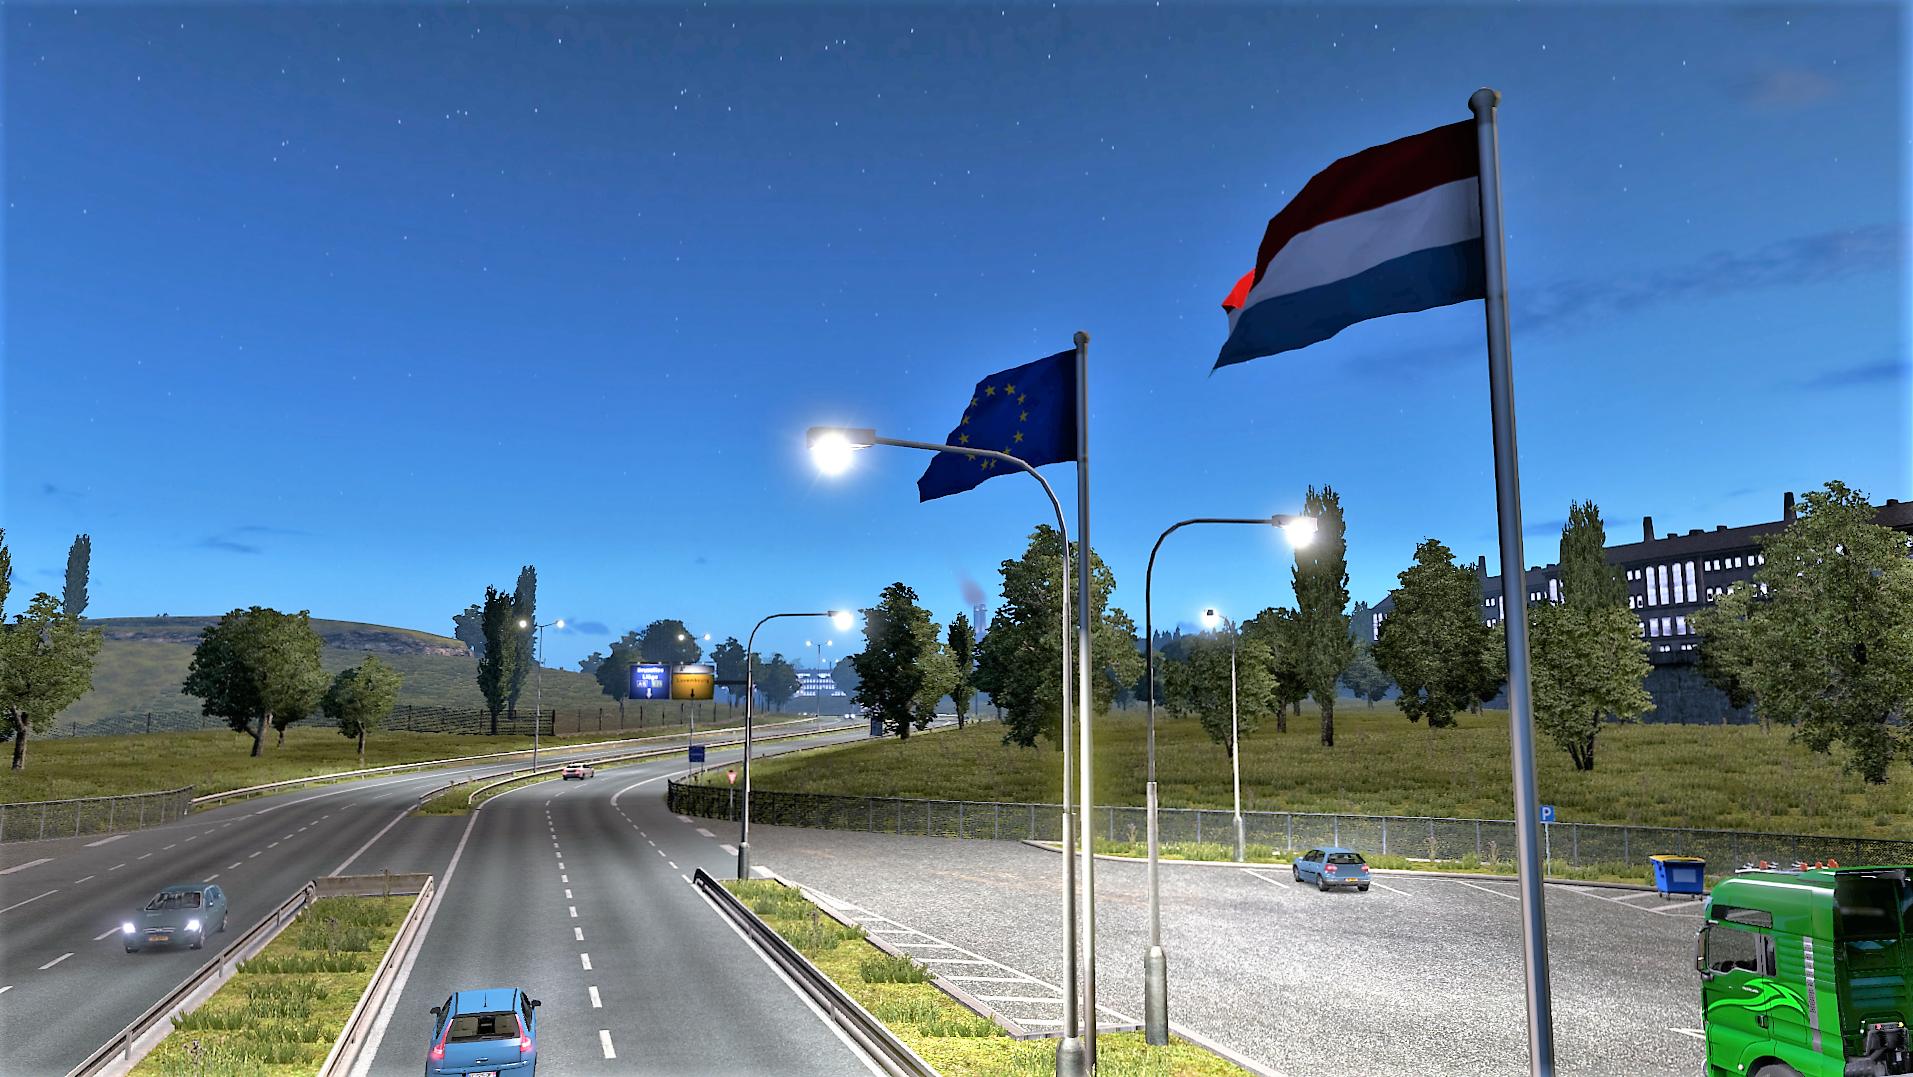 luxemburg land truck simulator wikia fandom powered. Black Bedroom Furniture Sets. Home Design Ideas